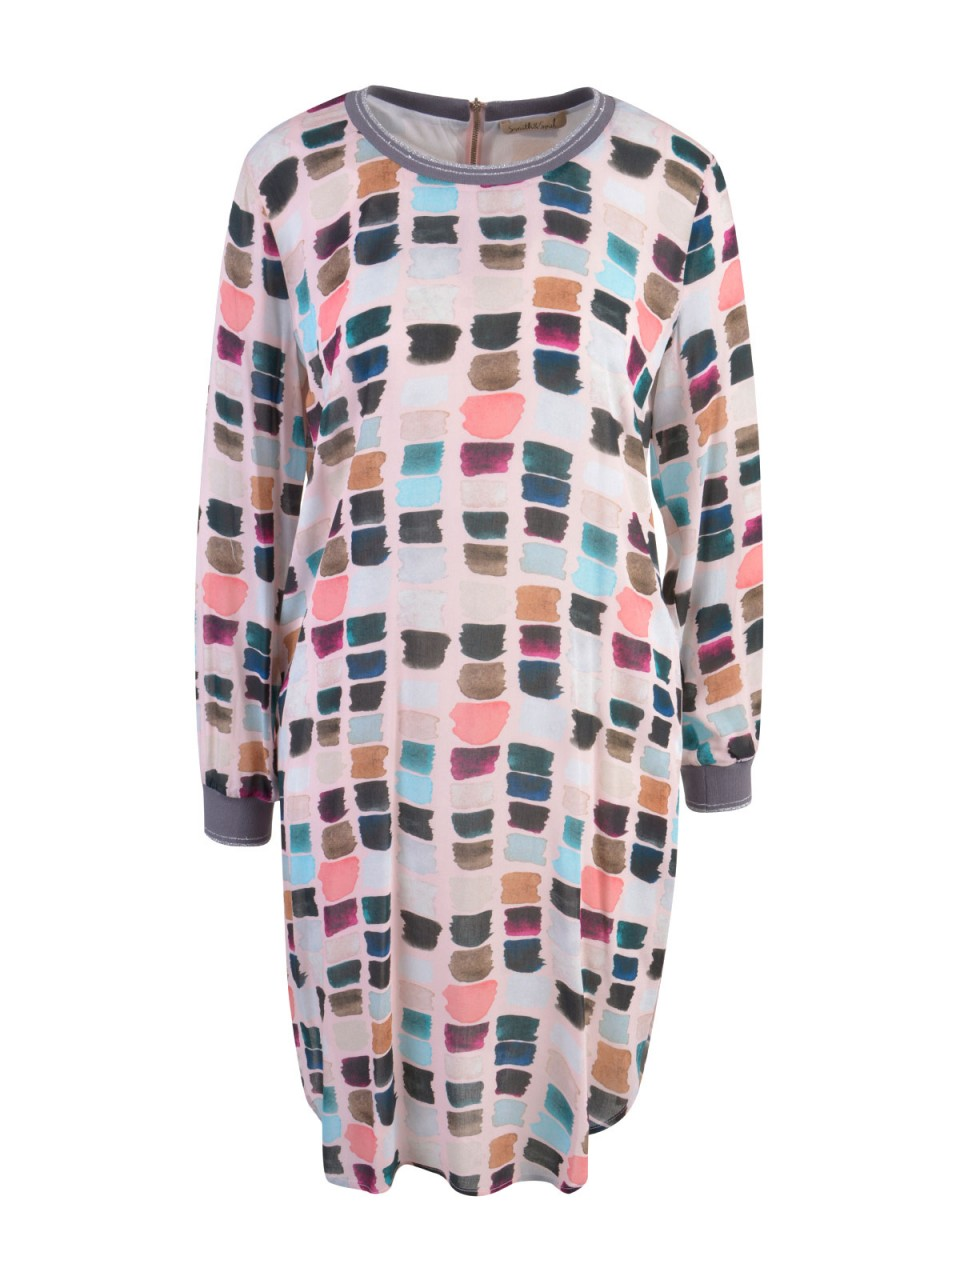 Premium Bluse Dirndl aus edlem Jacquard ° Lila Schwarz ...